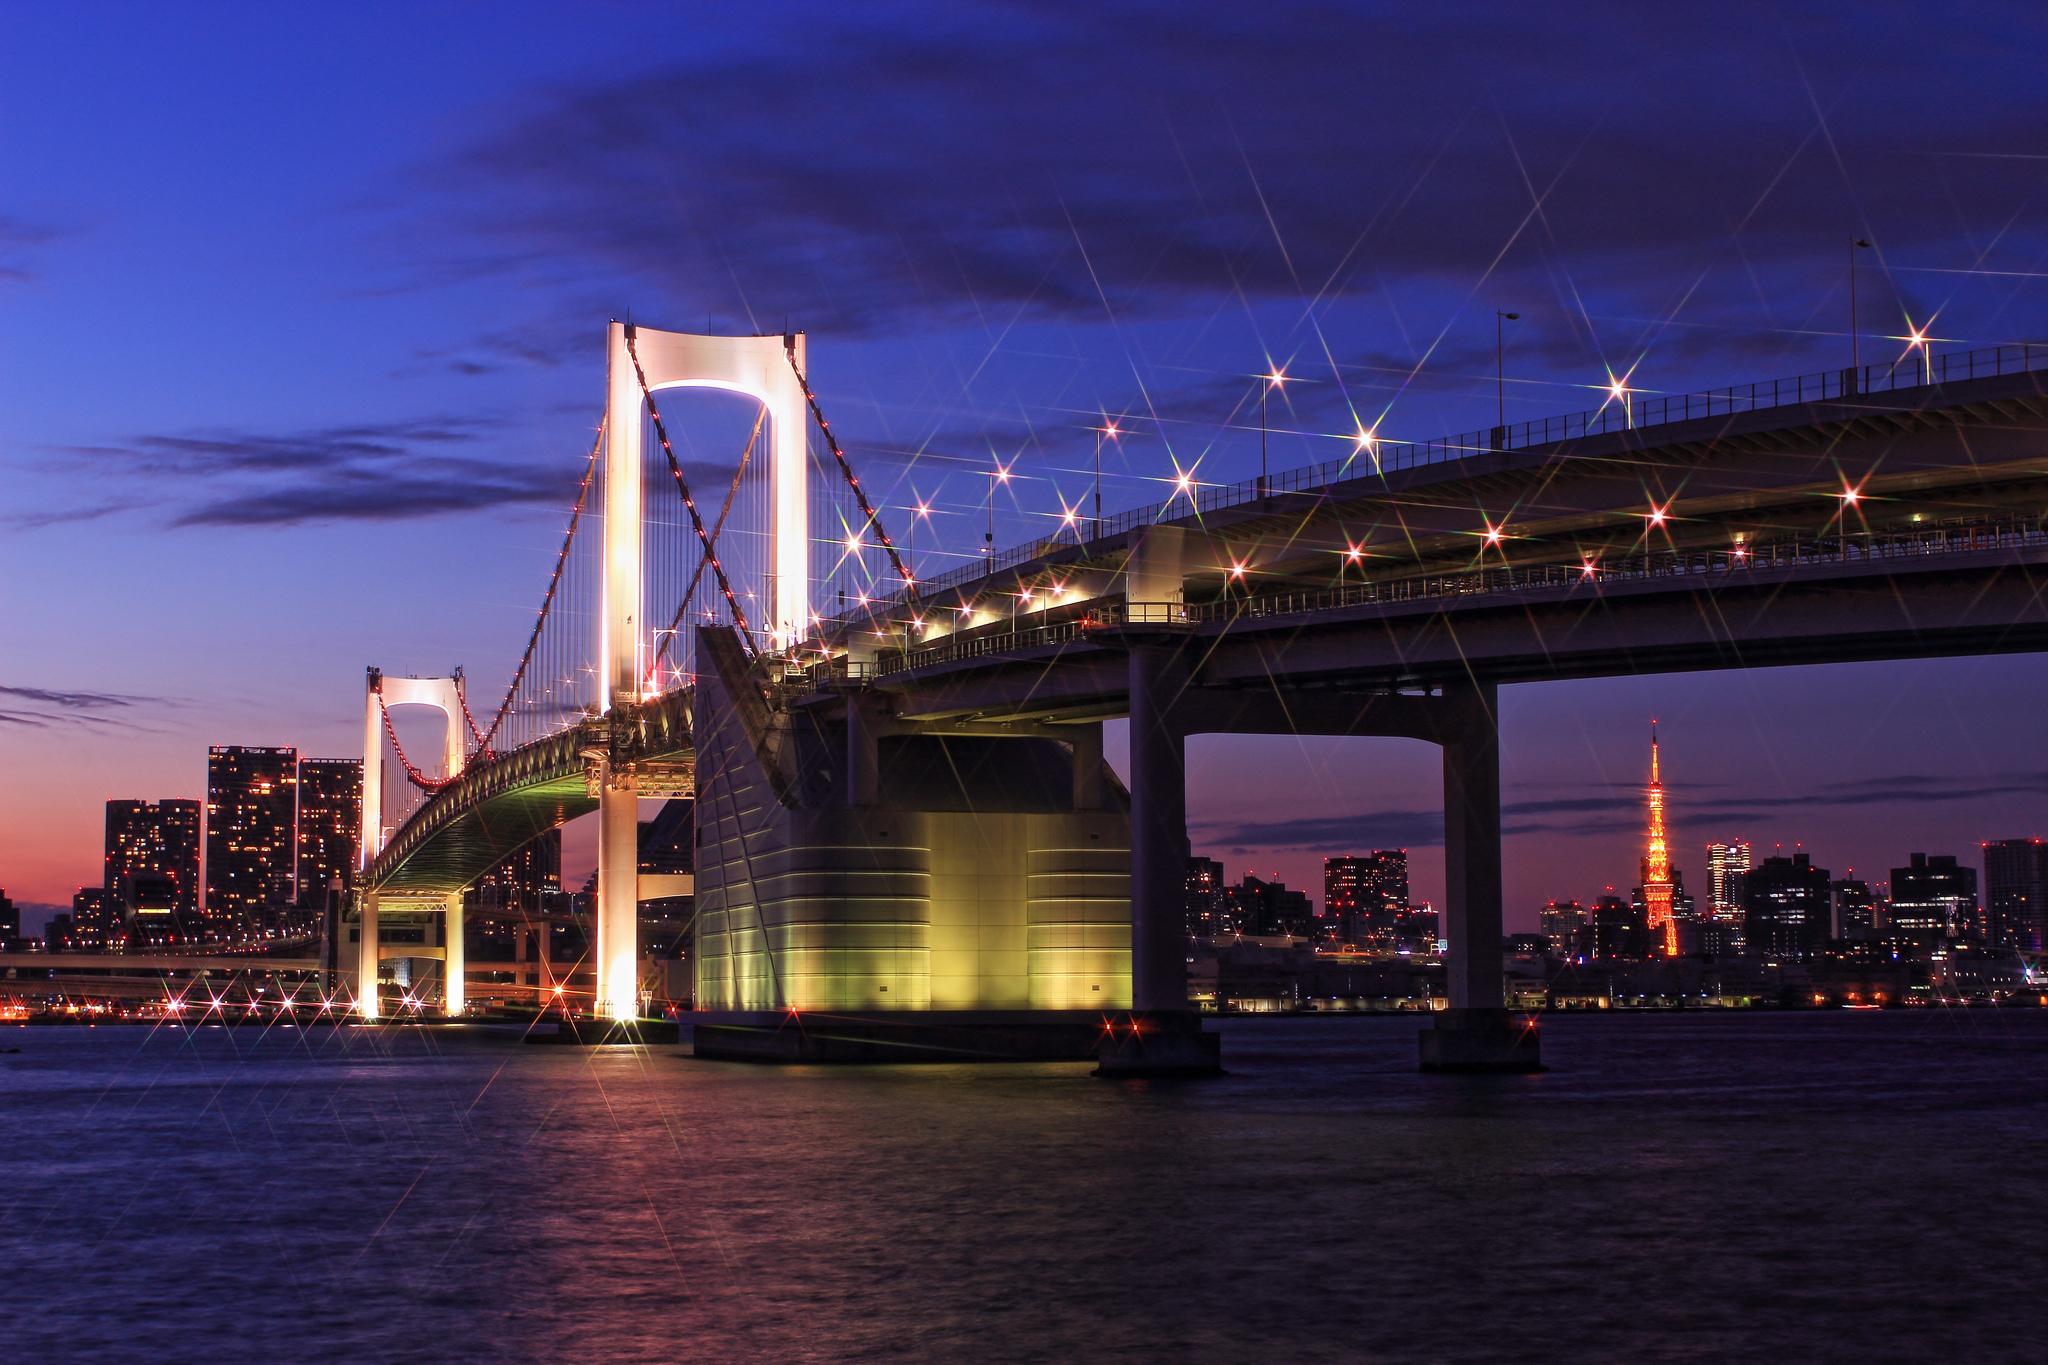 мост огни город залив без смс